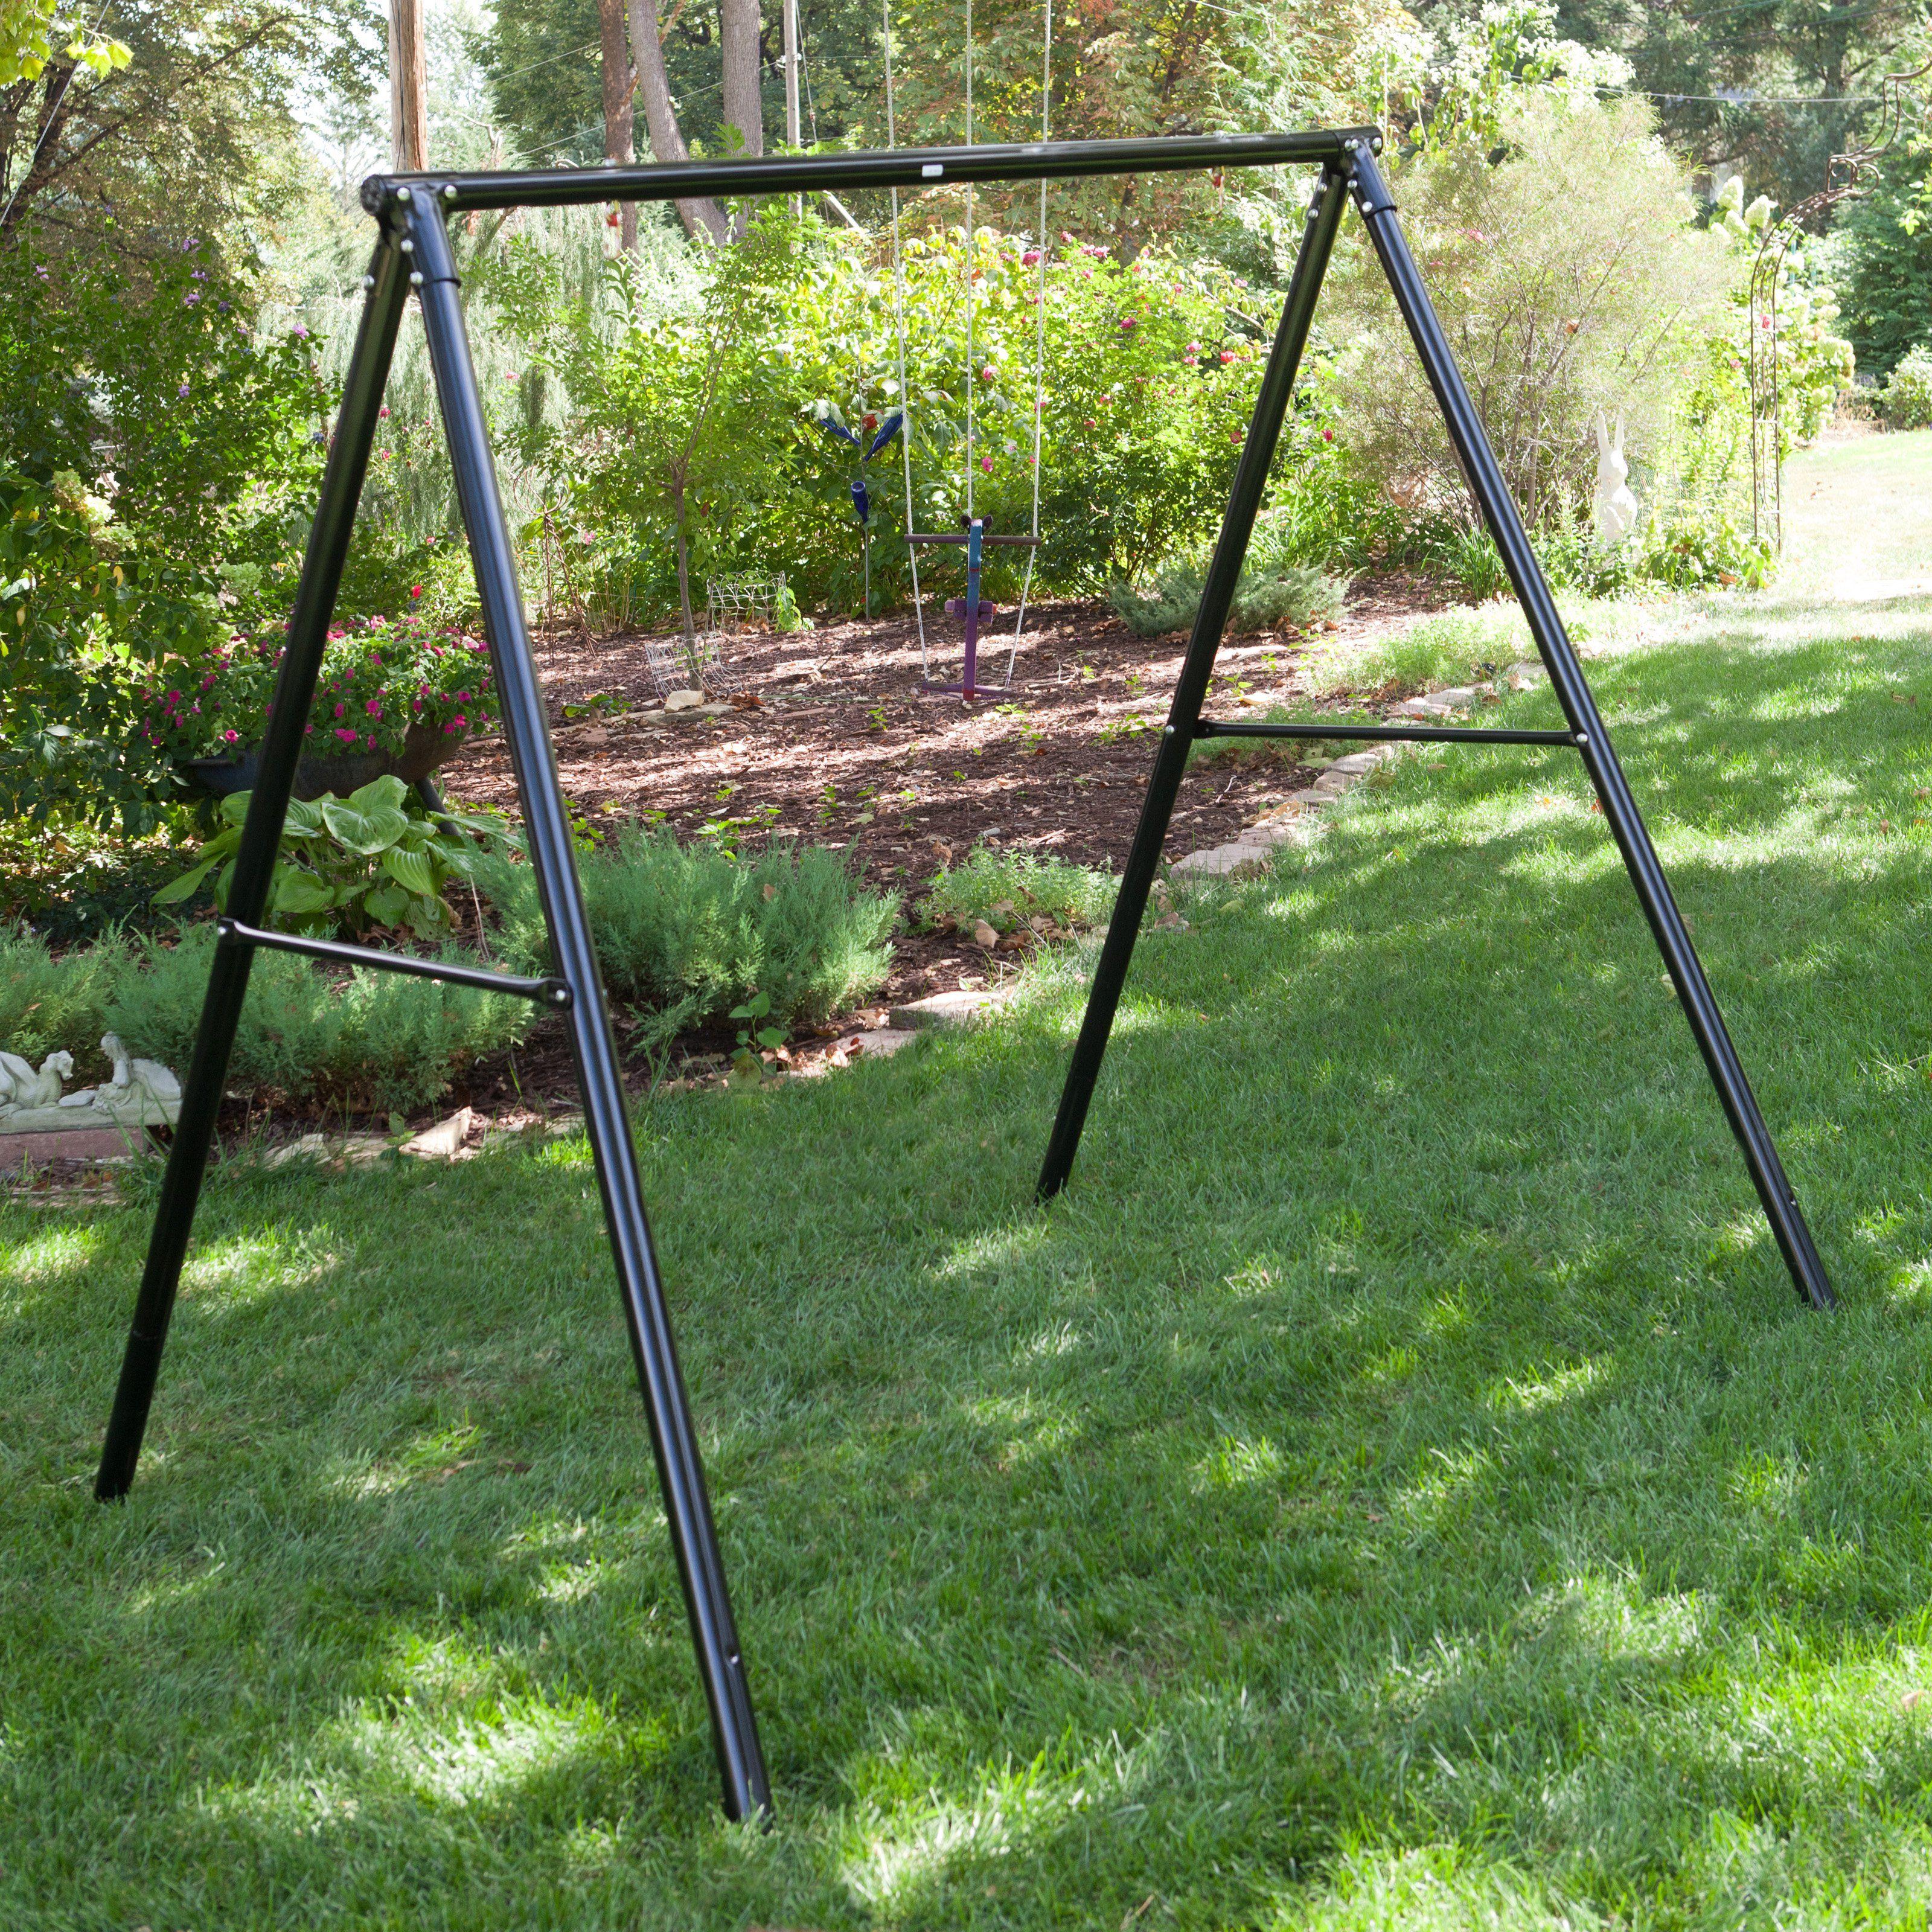 Patio swing set flexible flyer lawn swing frame t products